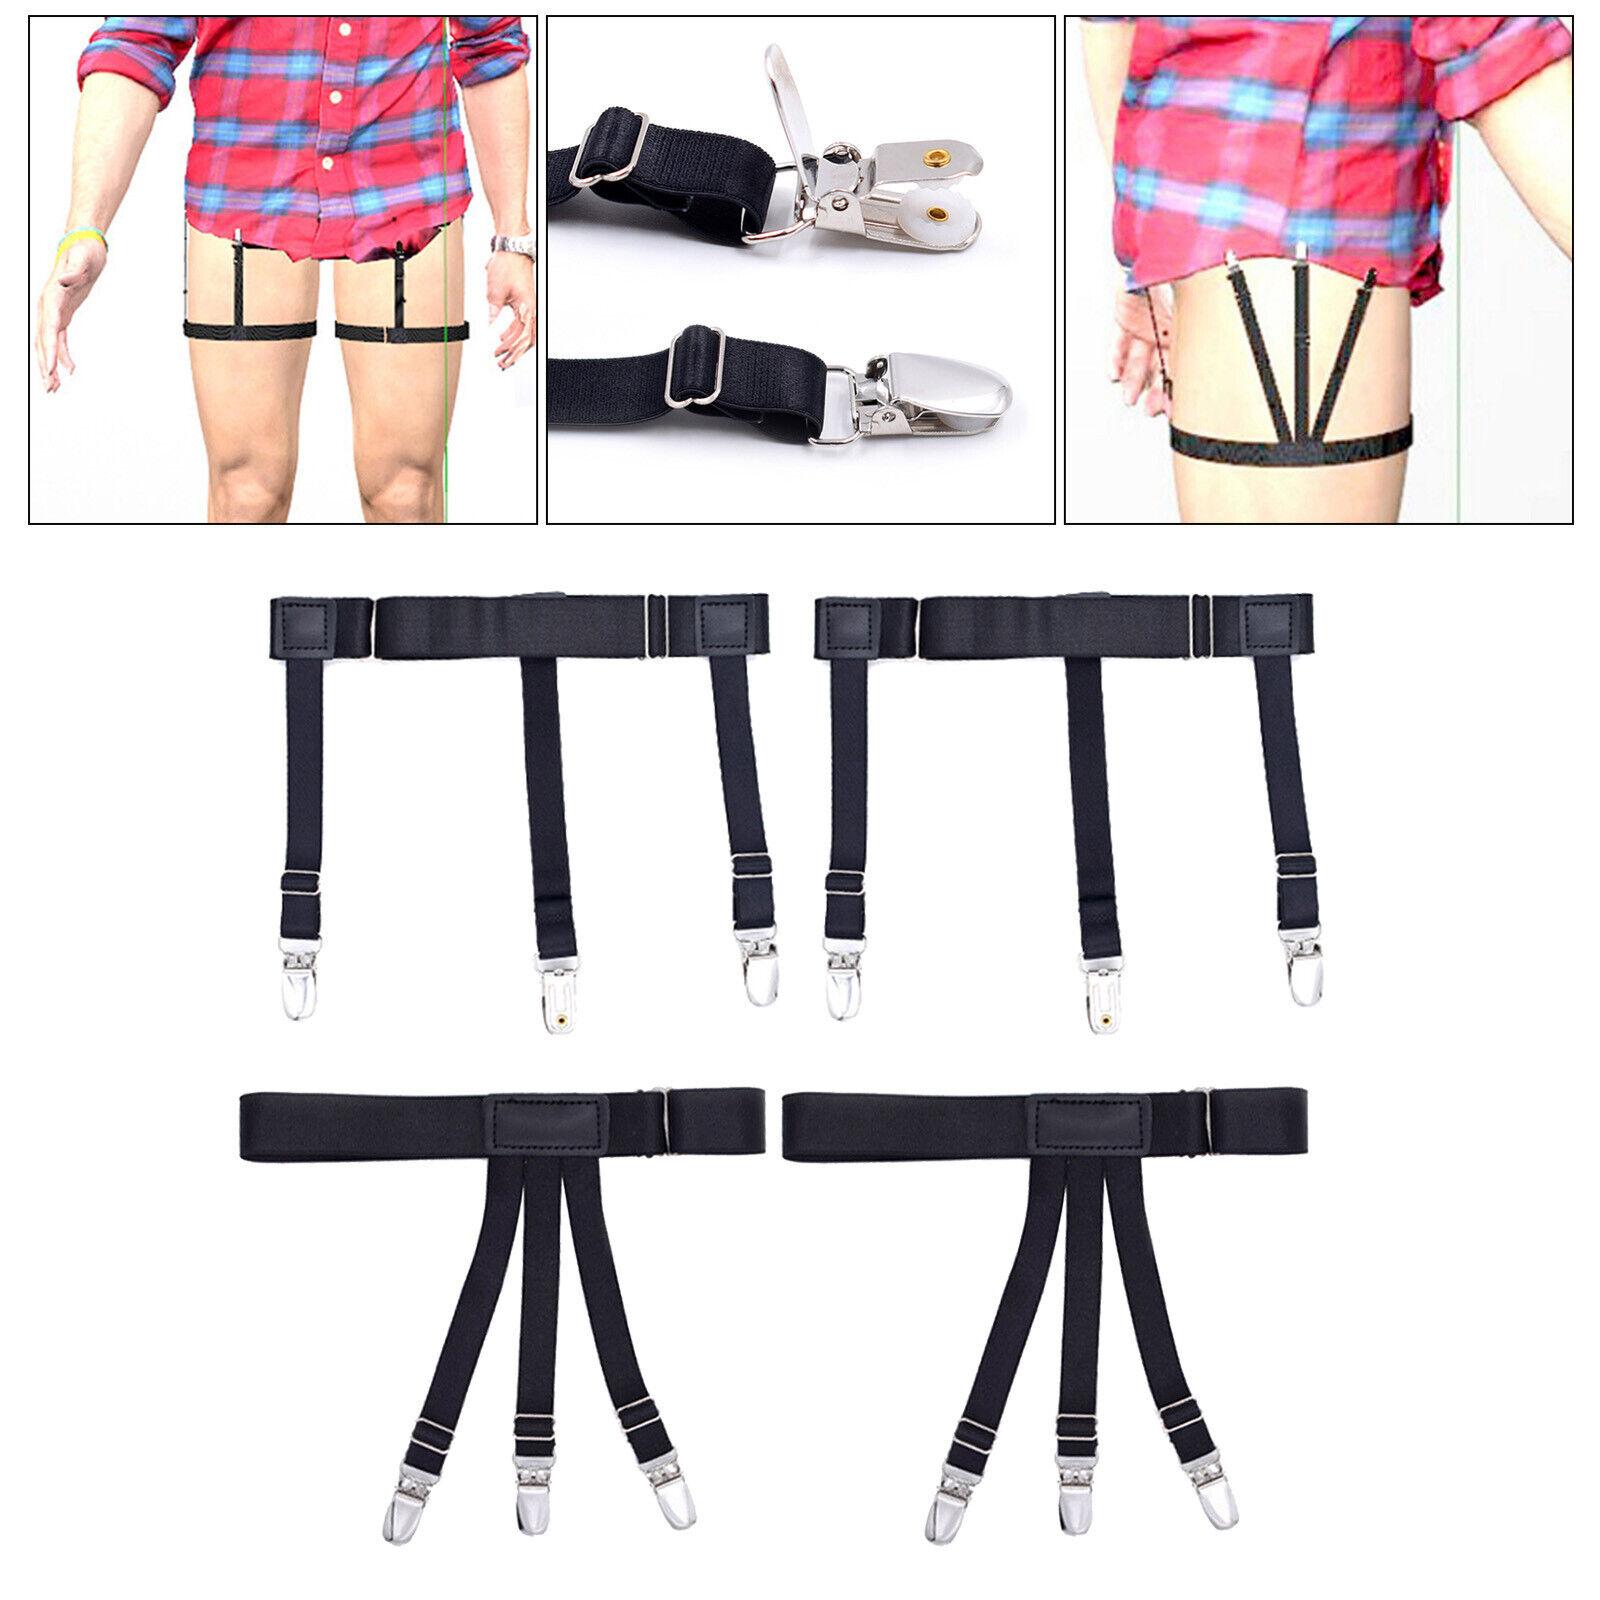 2x Shirt Stays Leg Garter Thigh Suspender Shirt Holders Elastic Military